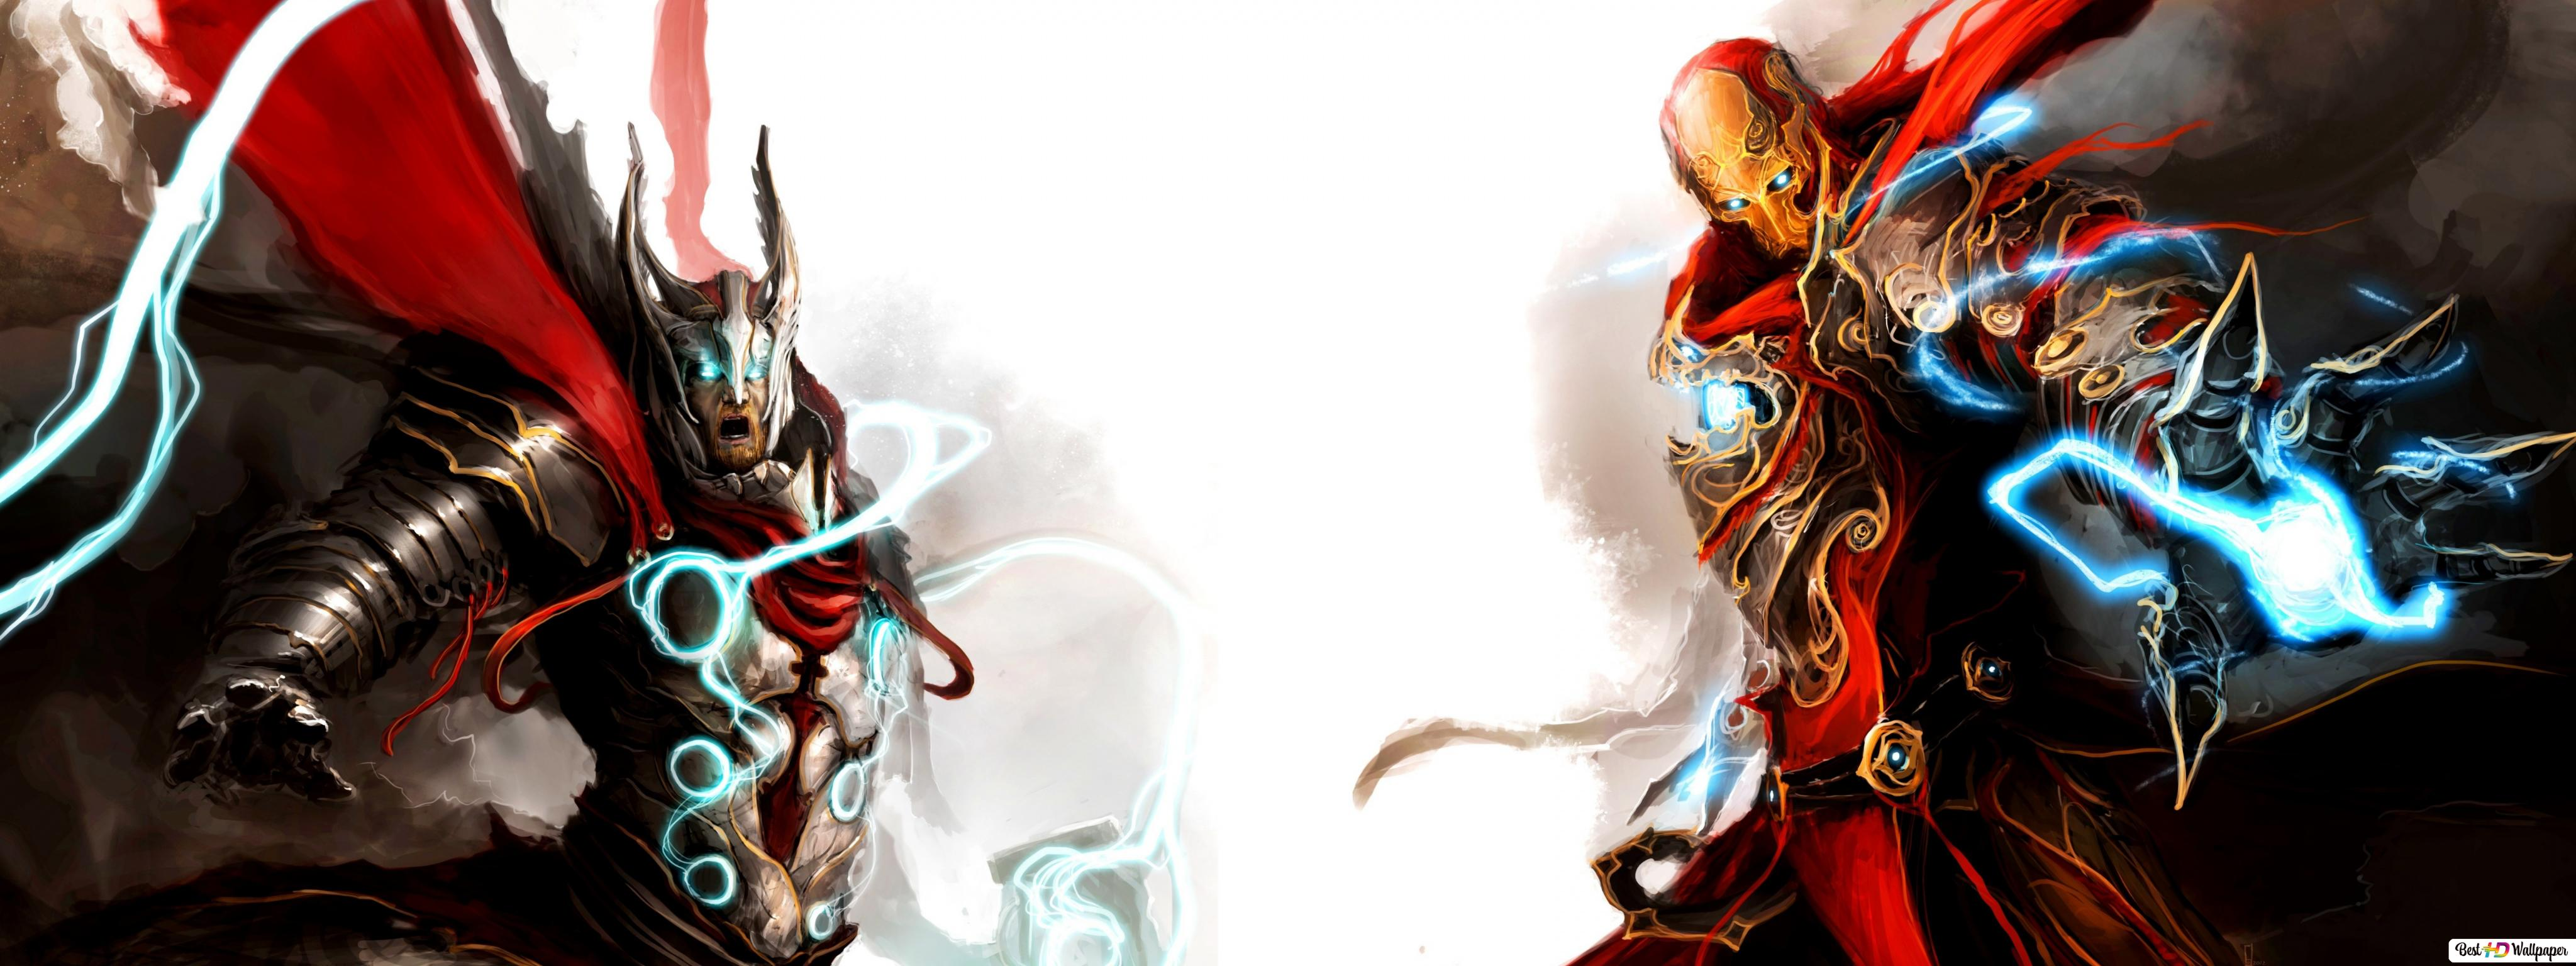 Digital Thor And Iron Man Hd Wallpaper Download